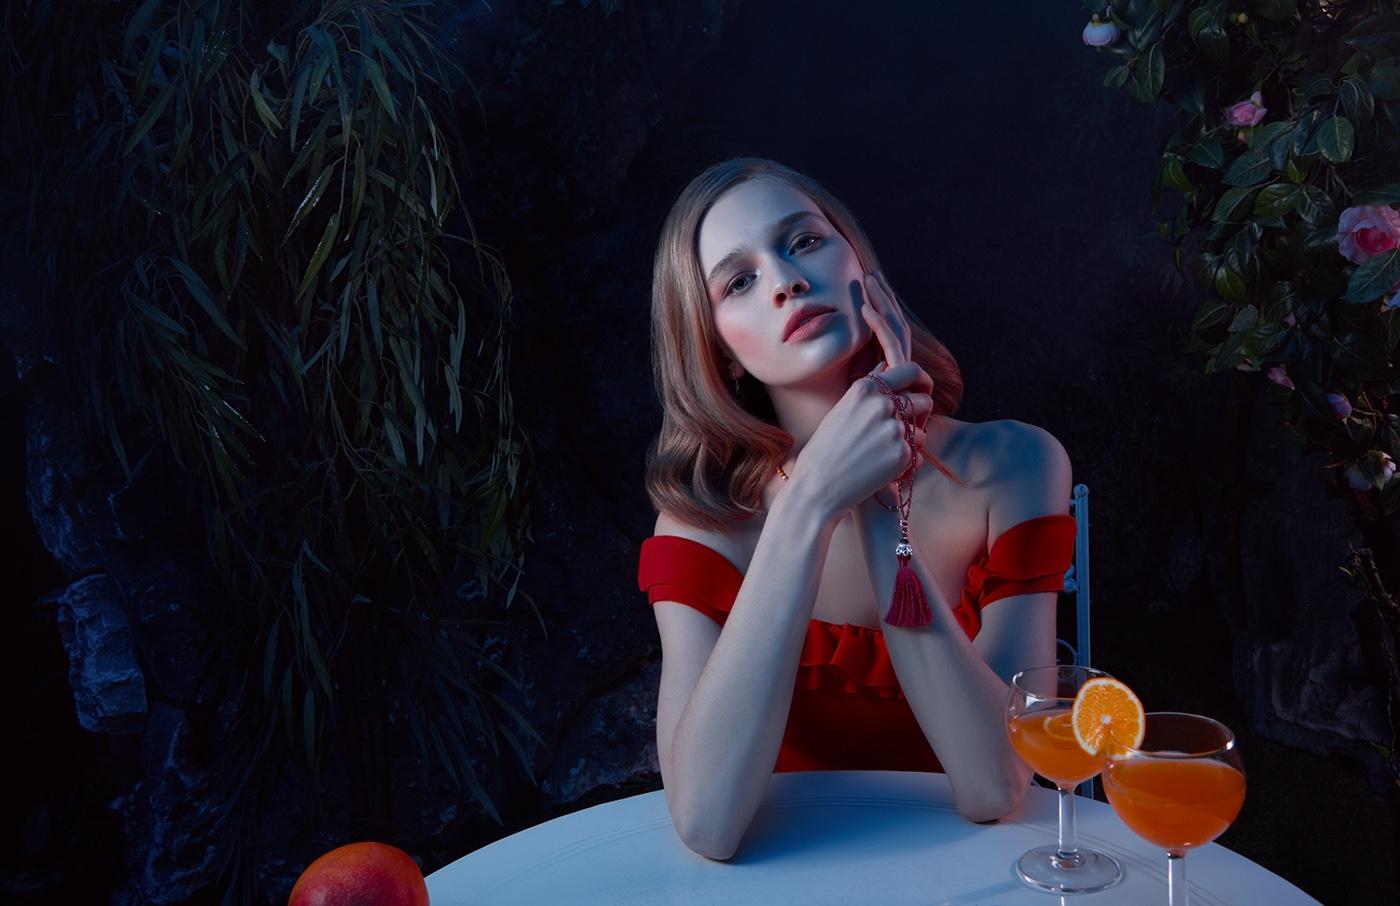 Voyage - Nasonpearl campaign, fashion photography by Ilona D. Veresk